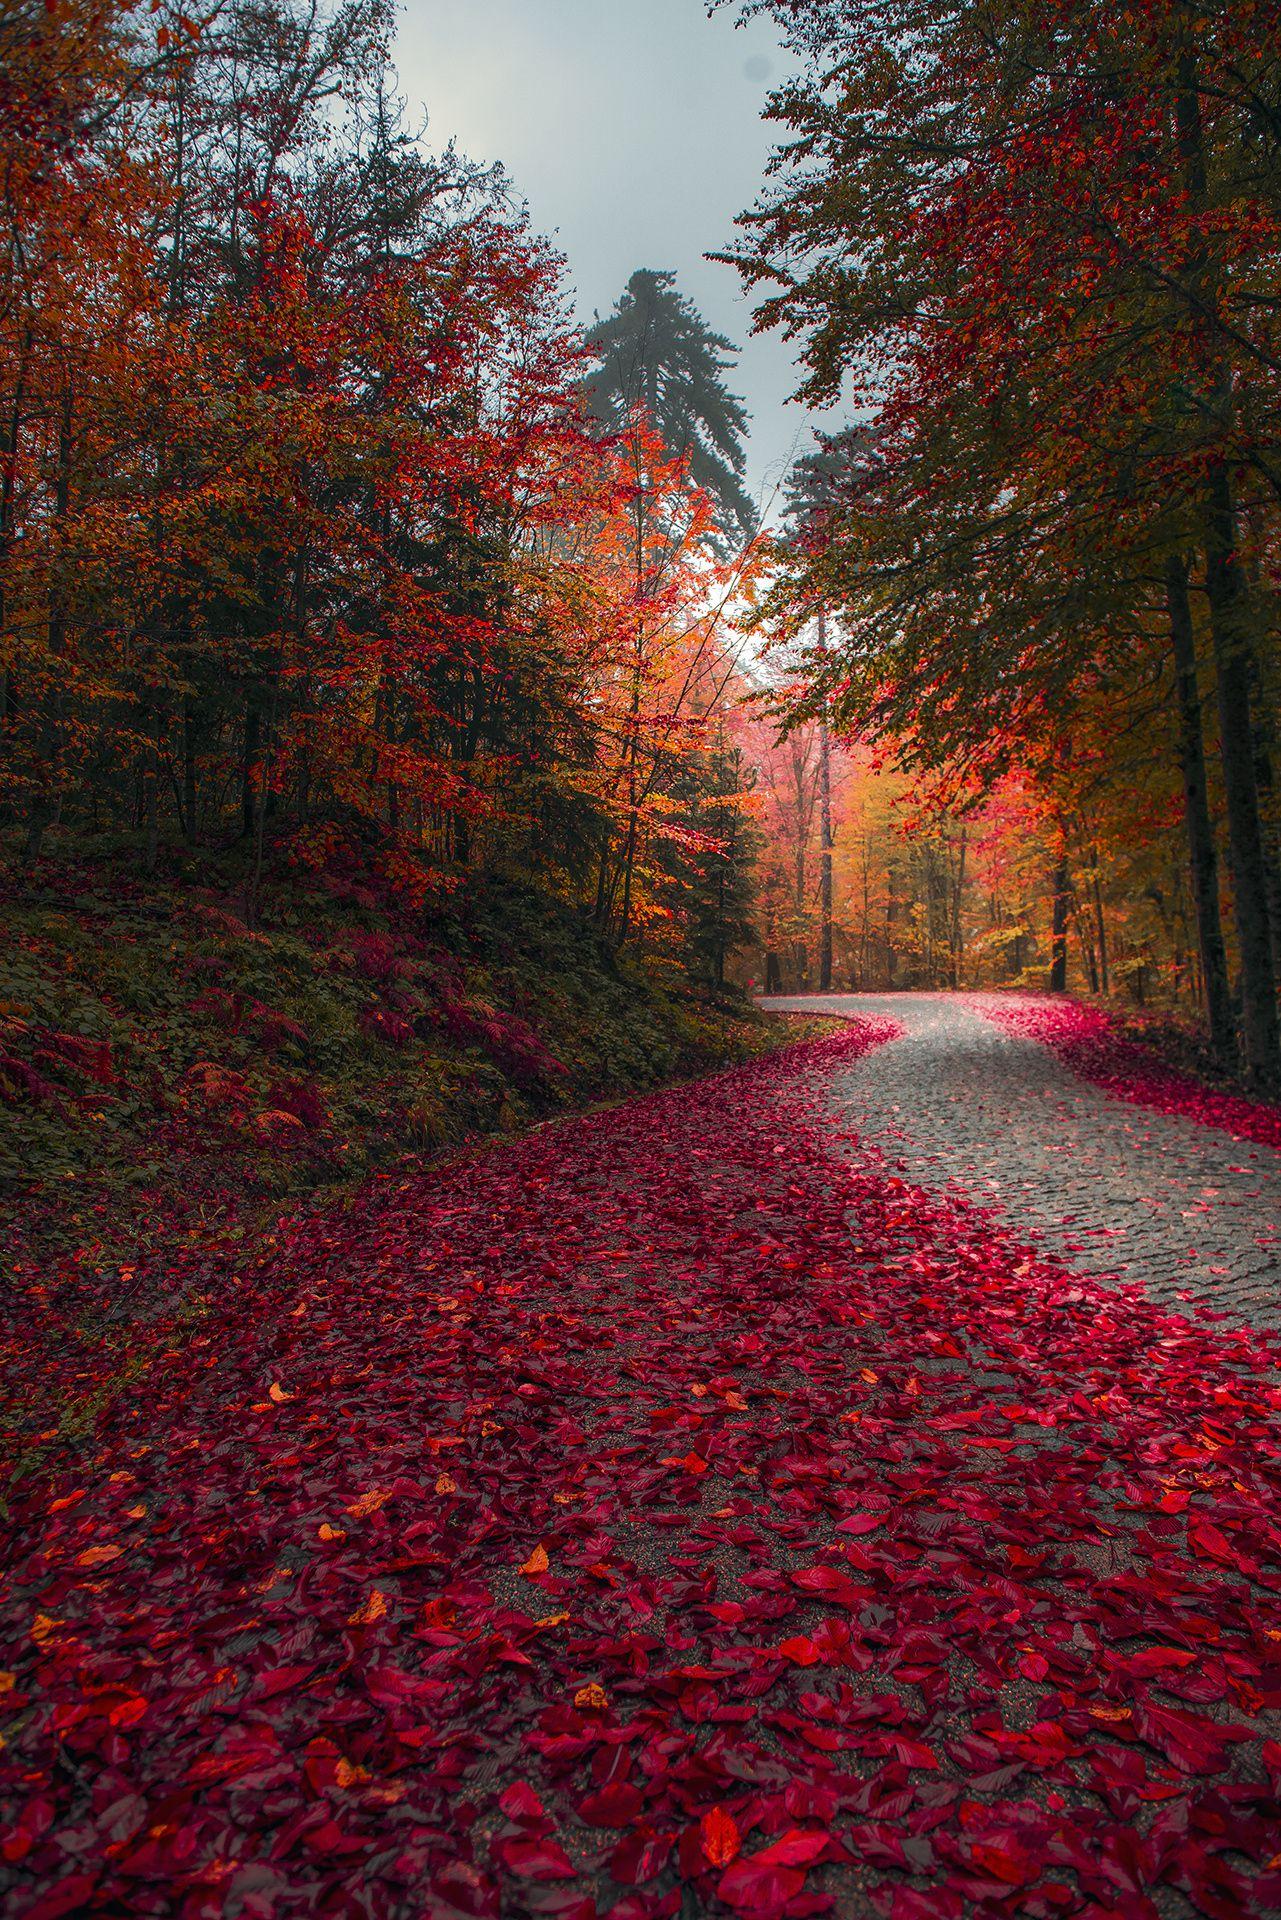 Red Autumn Road Landscape By Zeki Seferoglu Beautiful Nature Autumn Scenery Nature